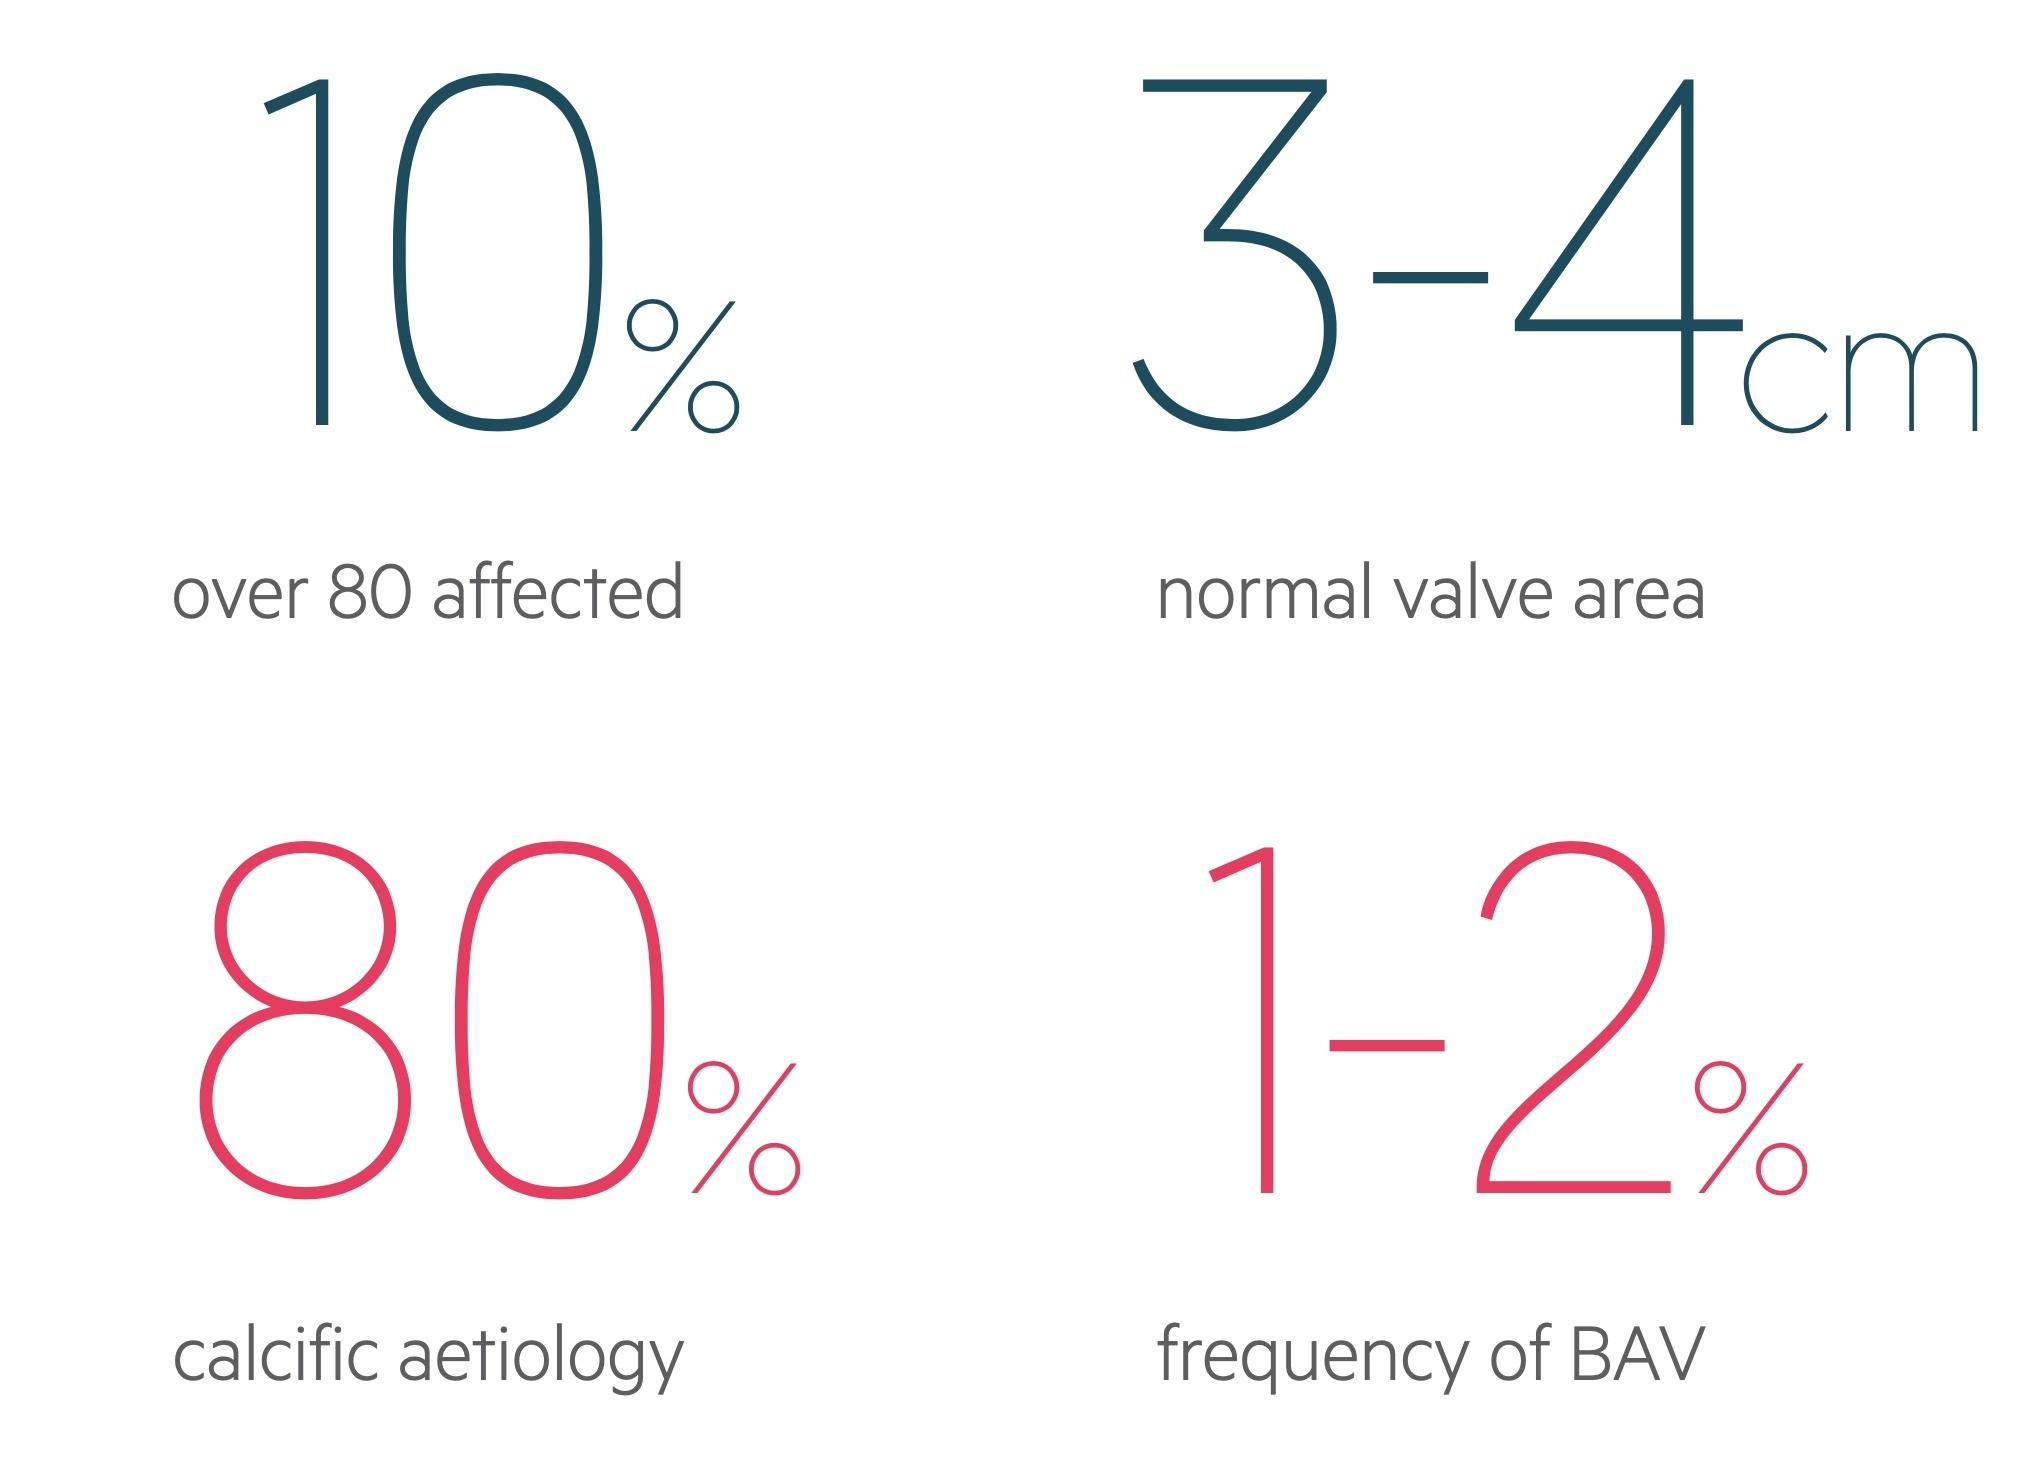 Aortic stenosis statistics